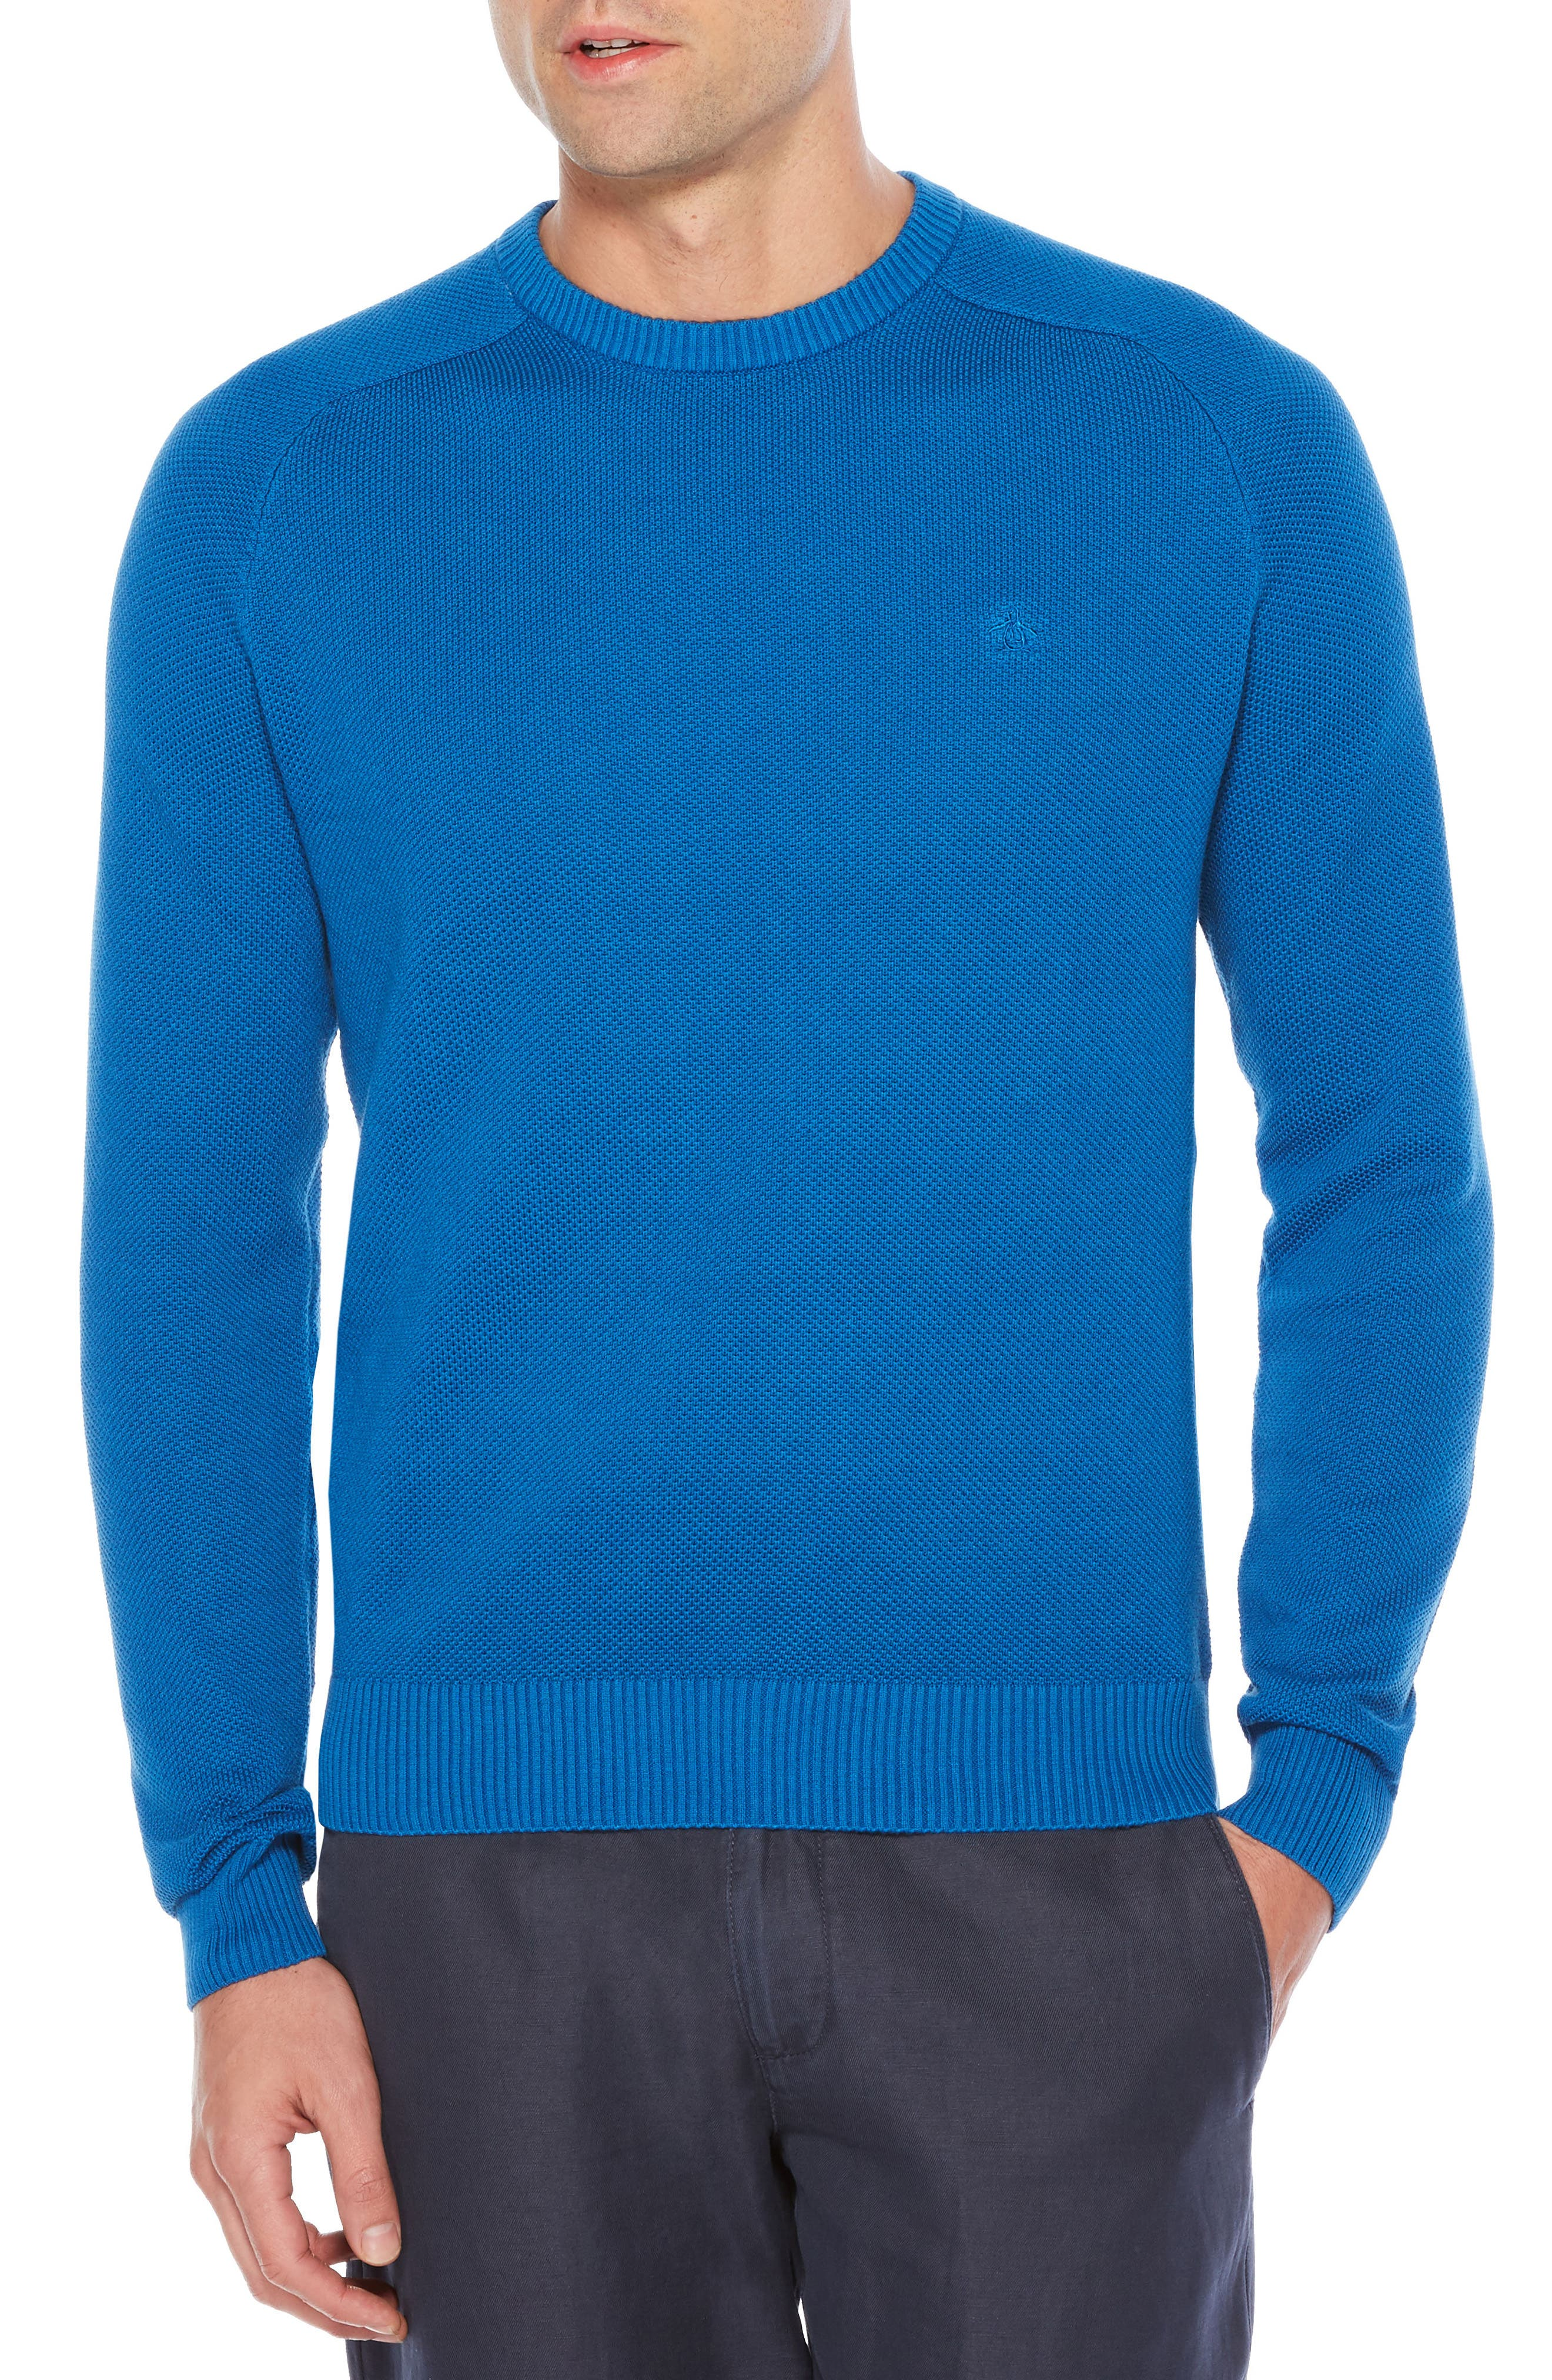 Alternate Image 1 Selected - Original Penguin Honeycomb Piqué Sweater